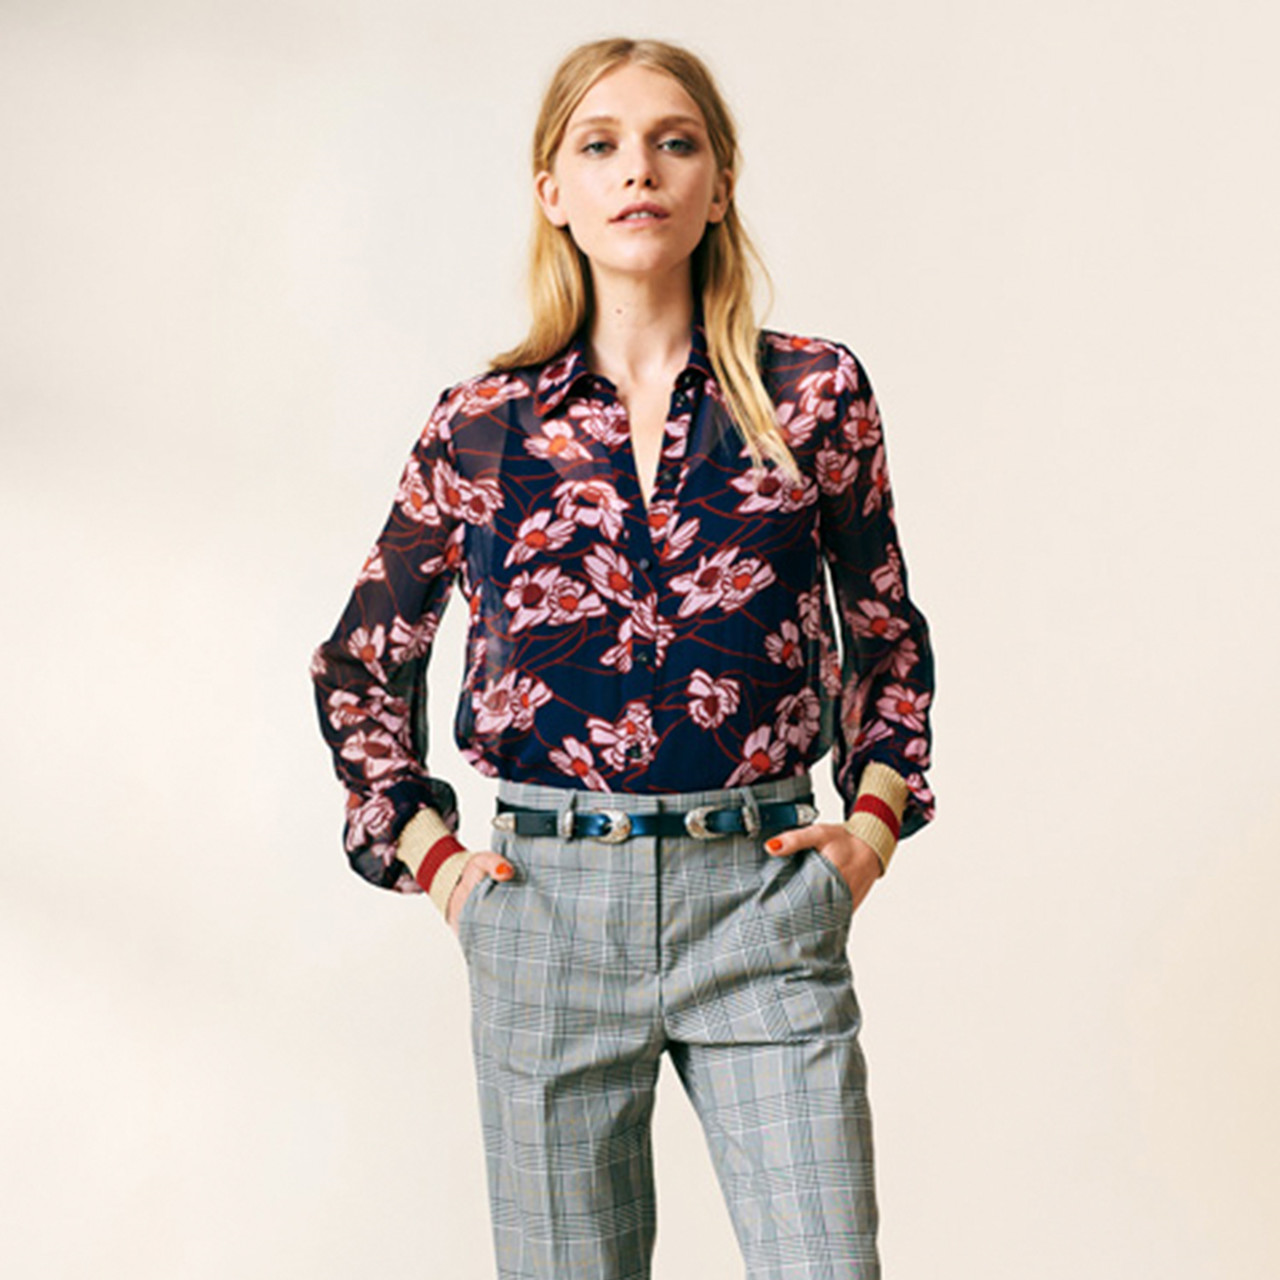 Madrona Skjorte i blå fra Baum und Pferdgarten - Køb din skjorte her!